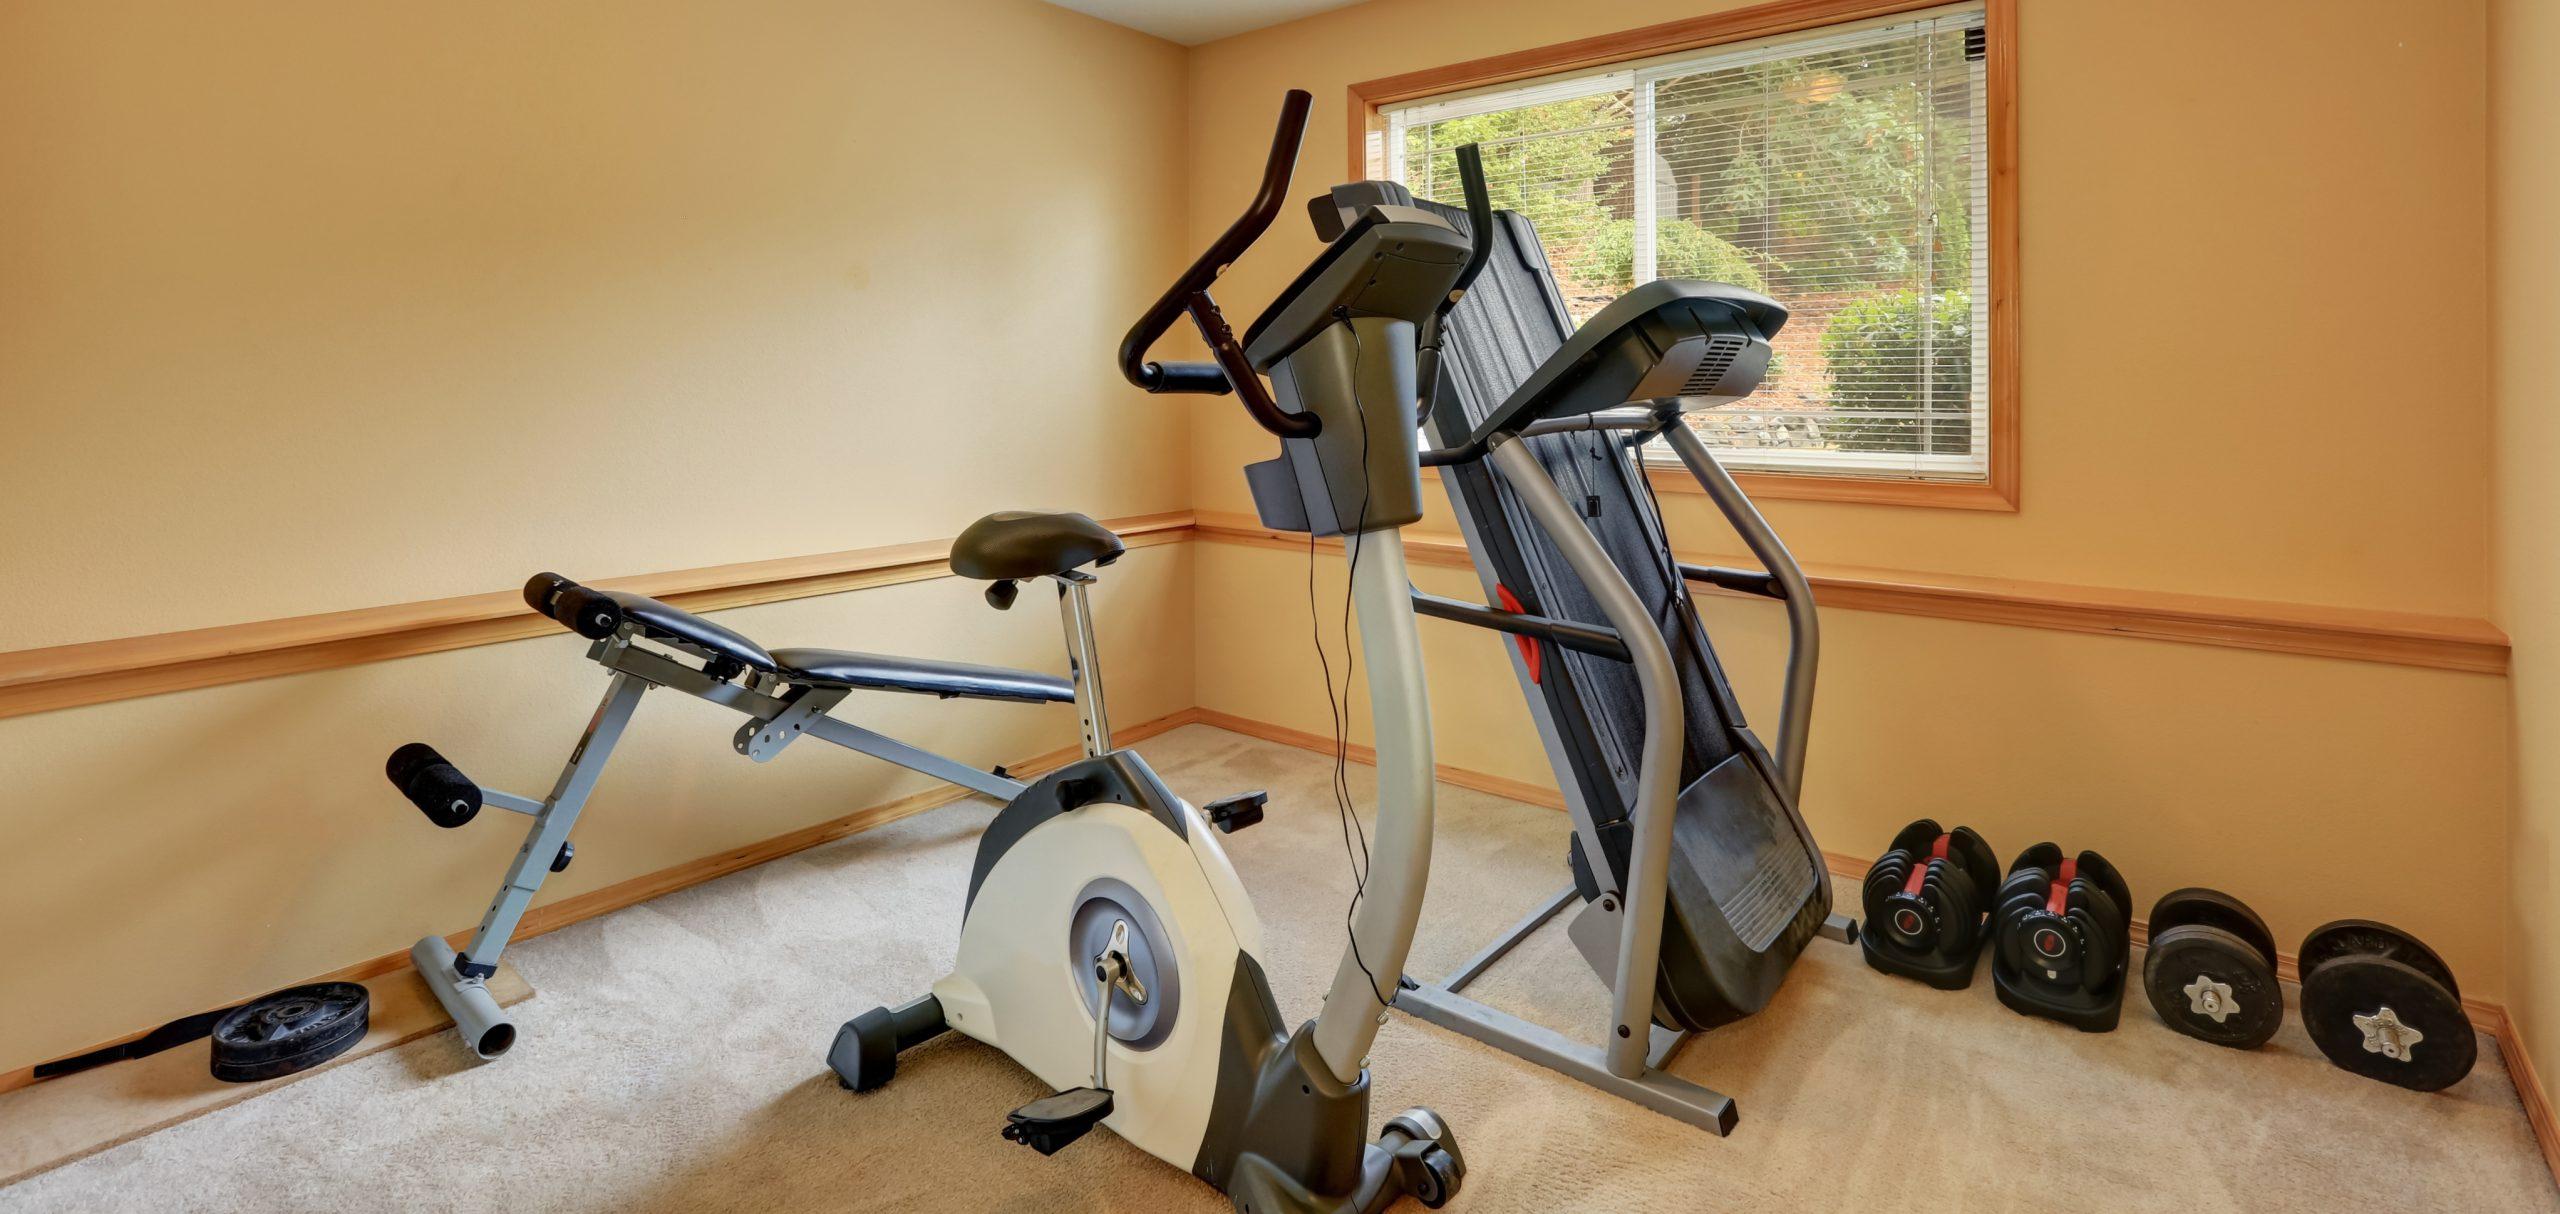 elliptical machine and dumbells